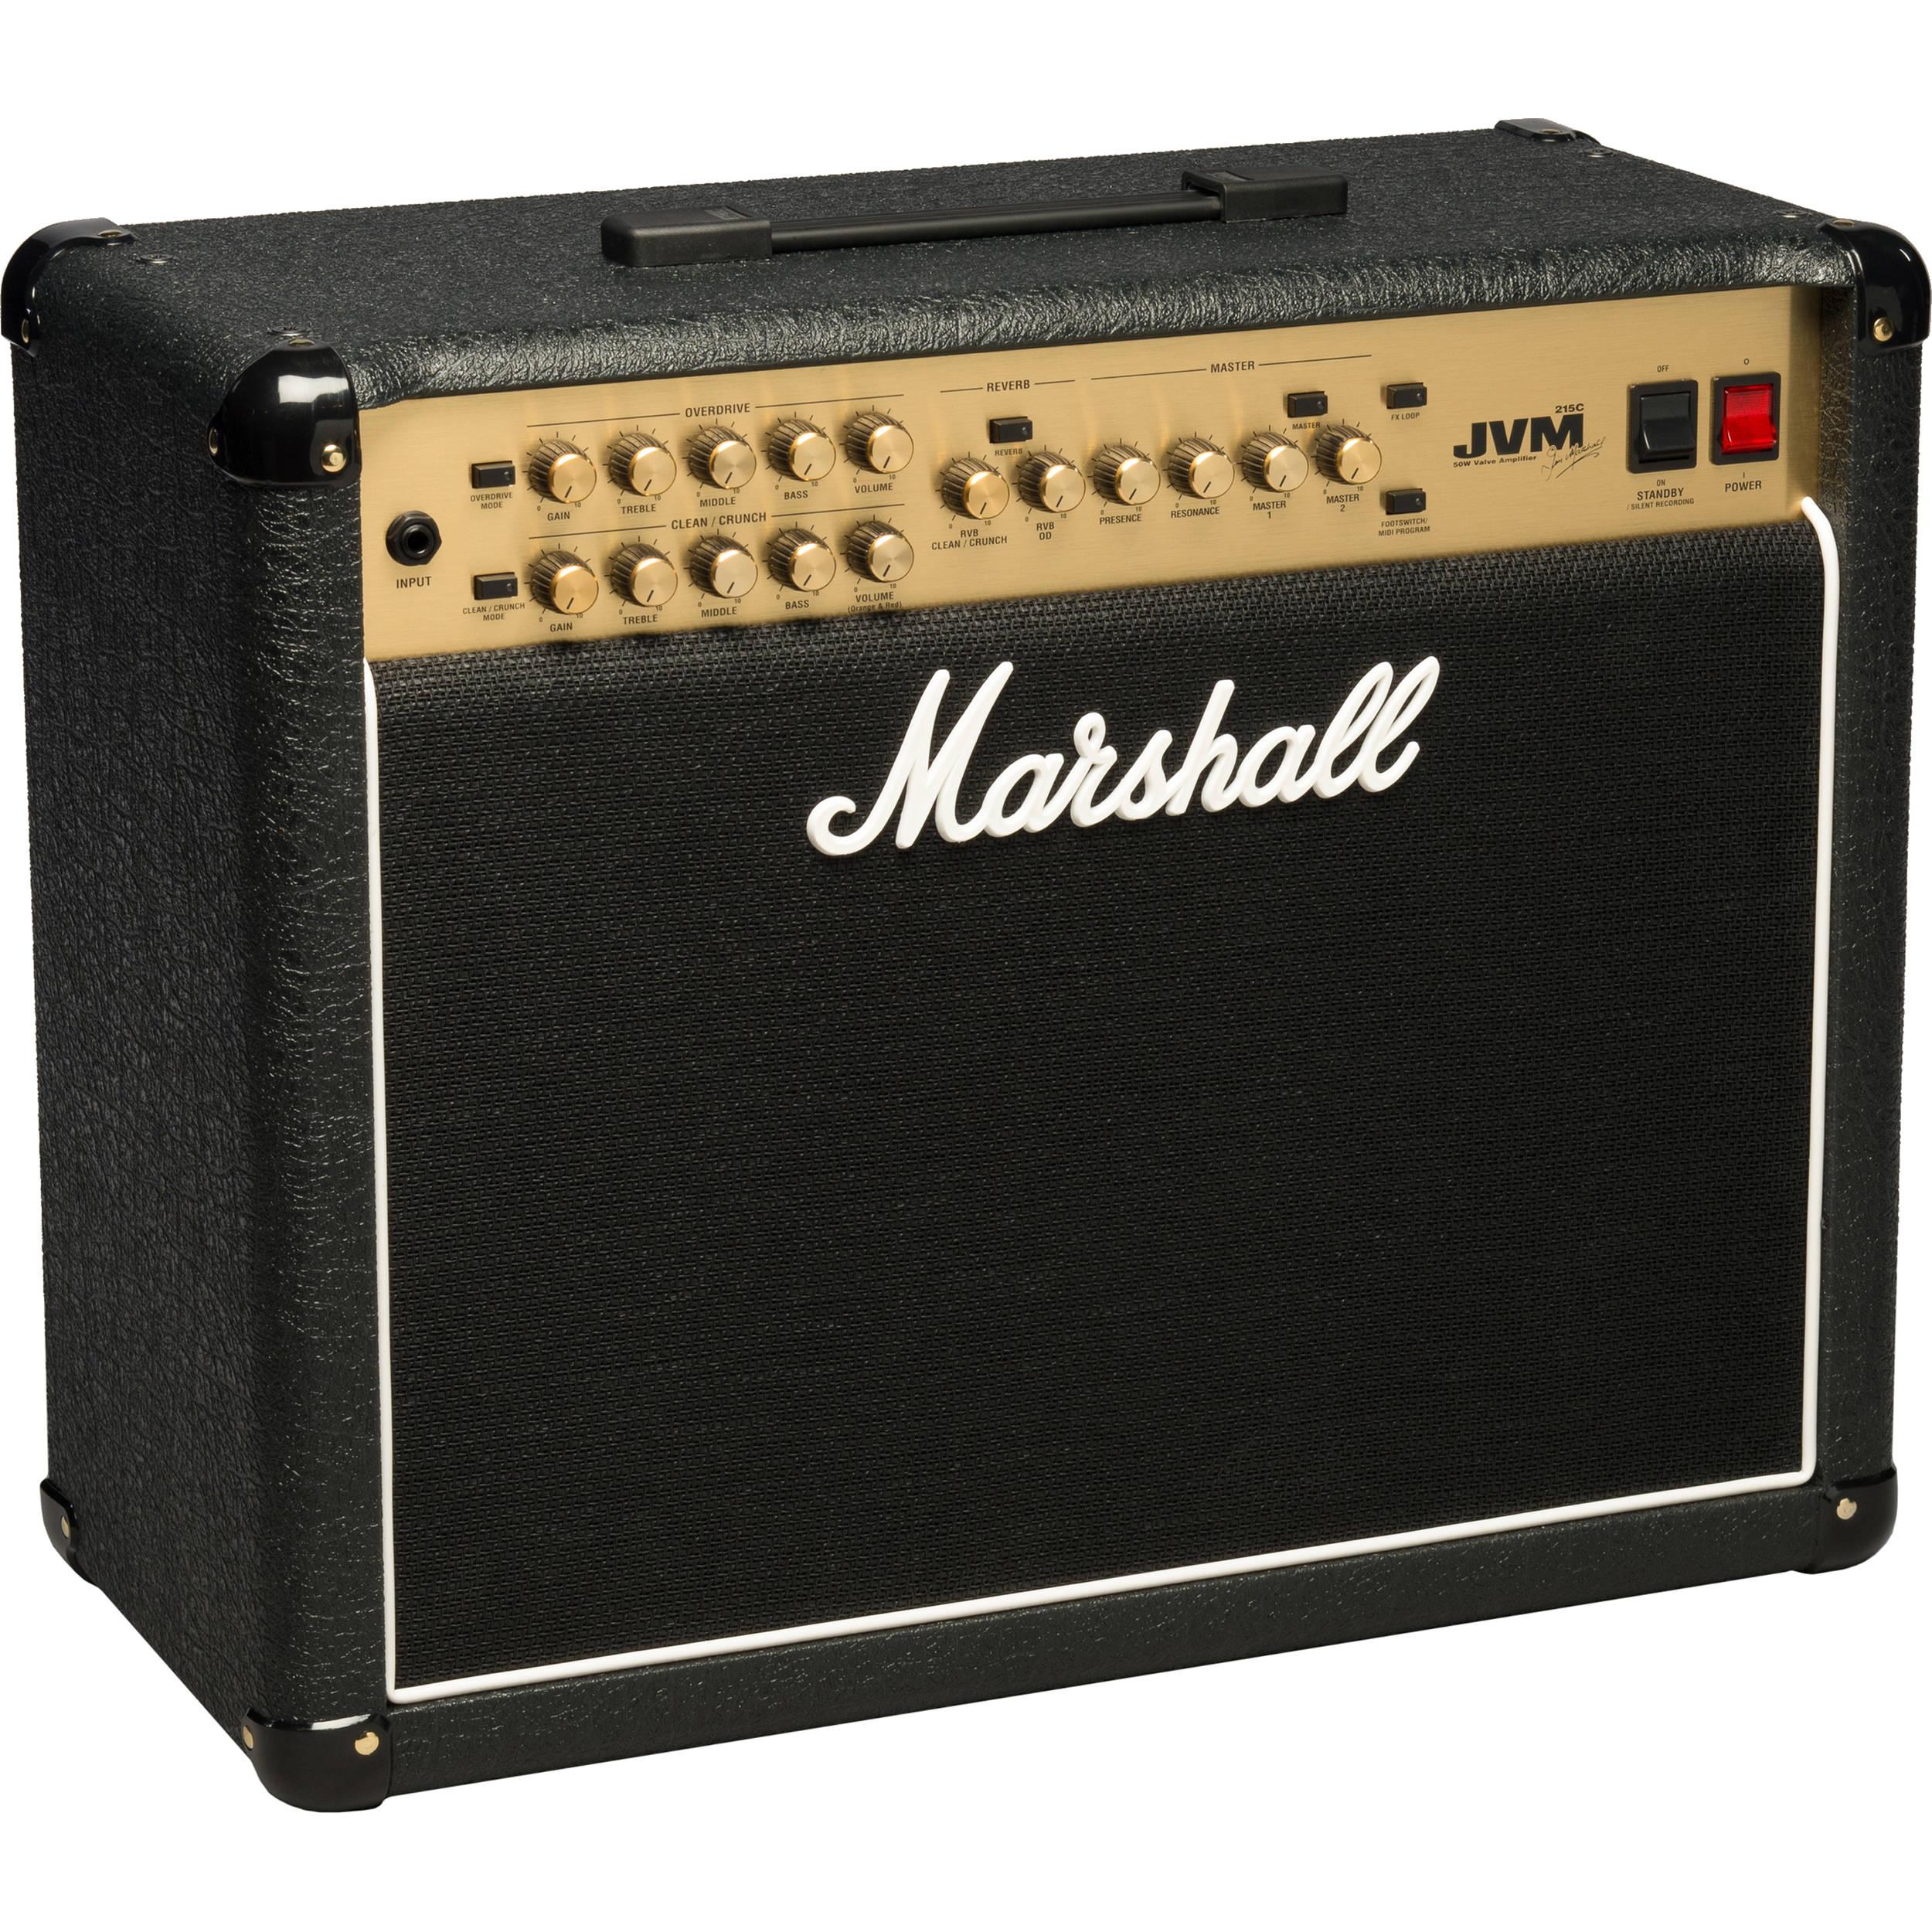 marshall amplification jvm215c 50w 1x12 combo m jvm215c u b h. Black Bedroom Furniture Sets. Home Design Ideas